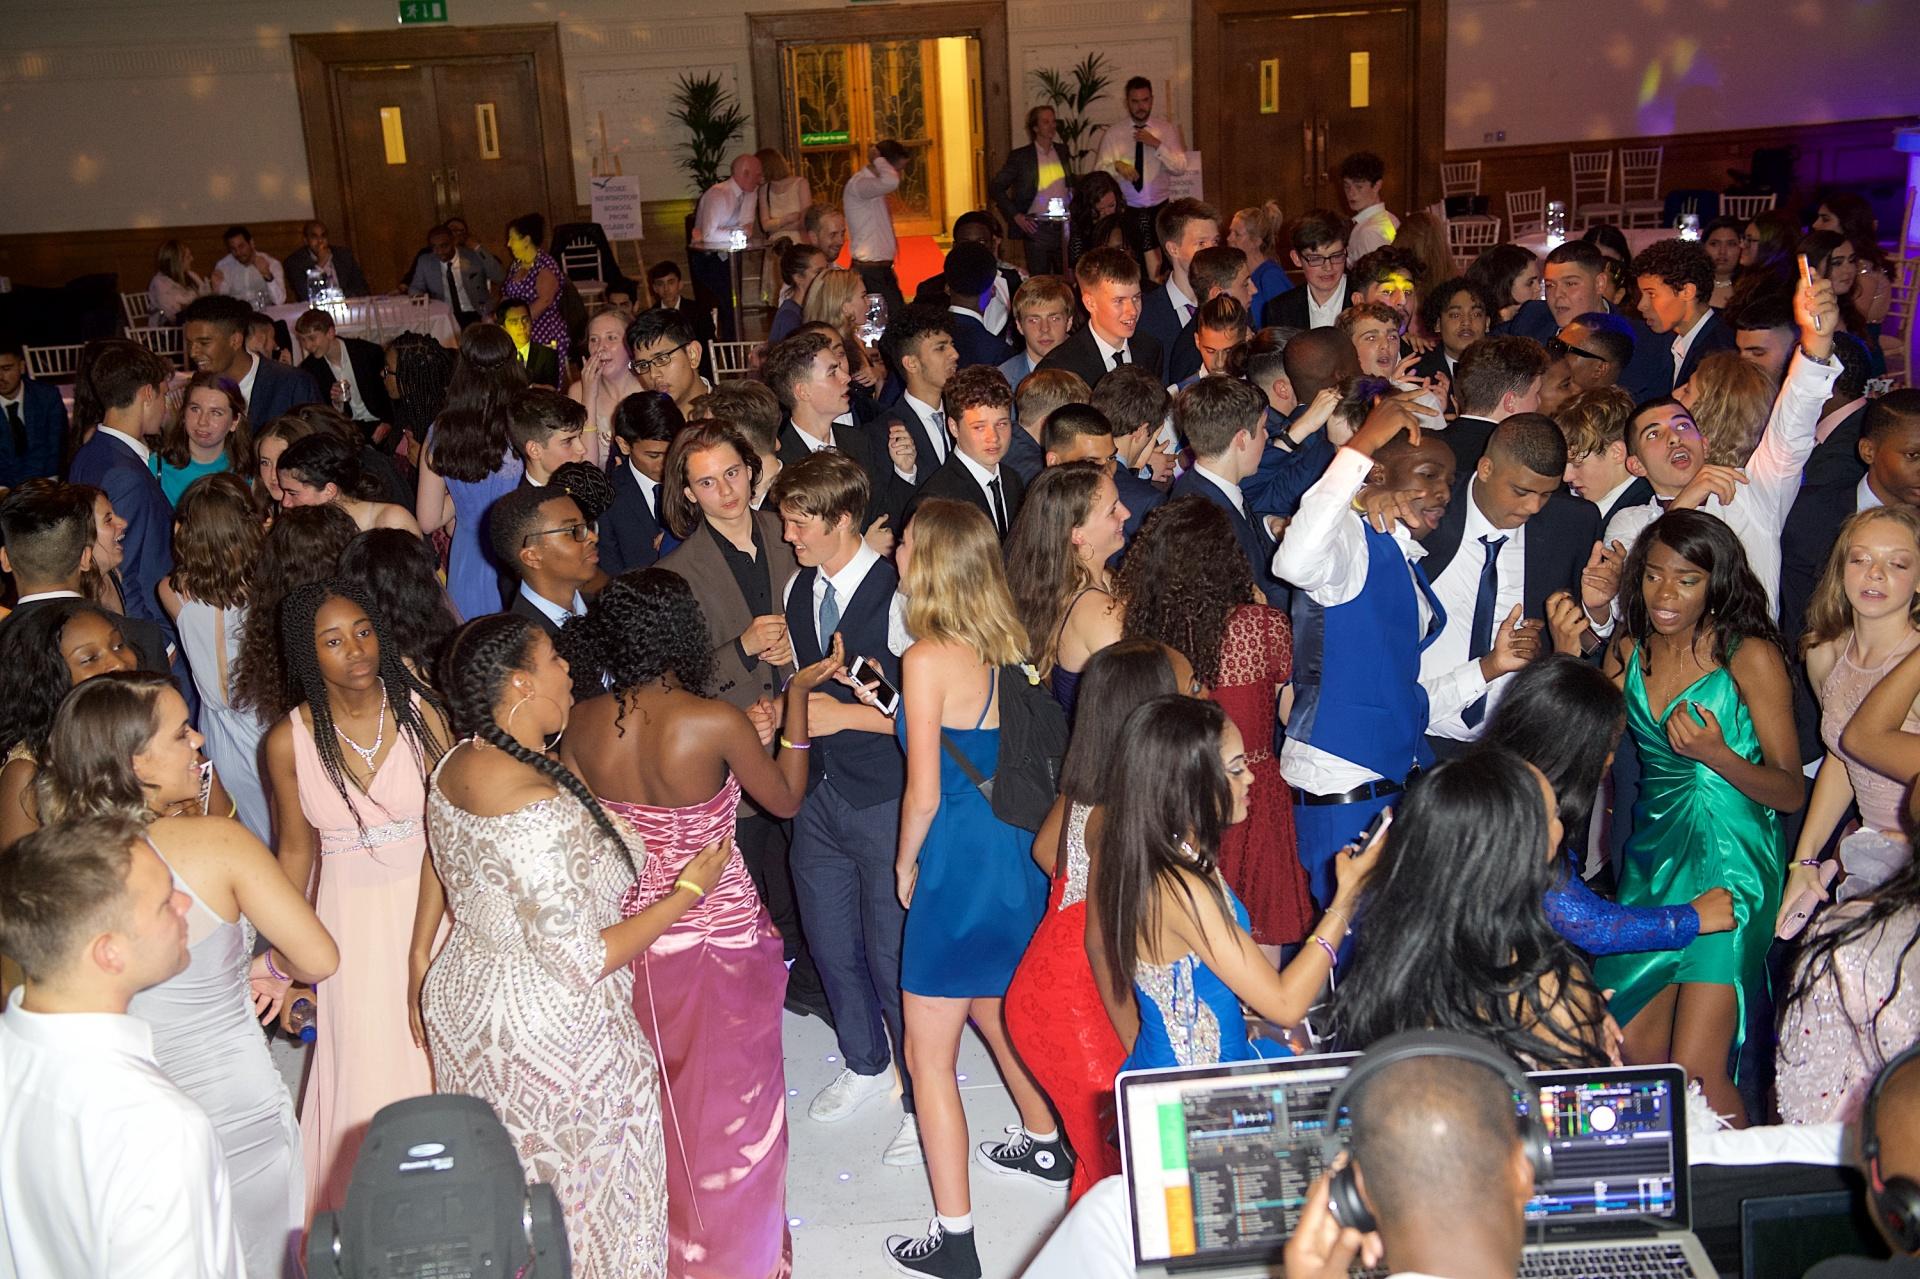 S Klass Ent School Prom